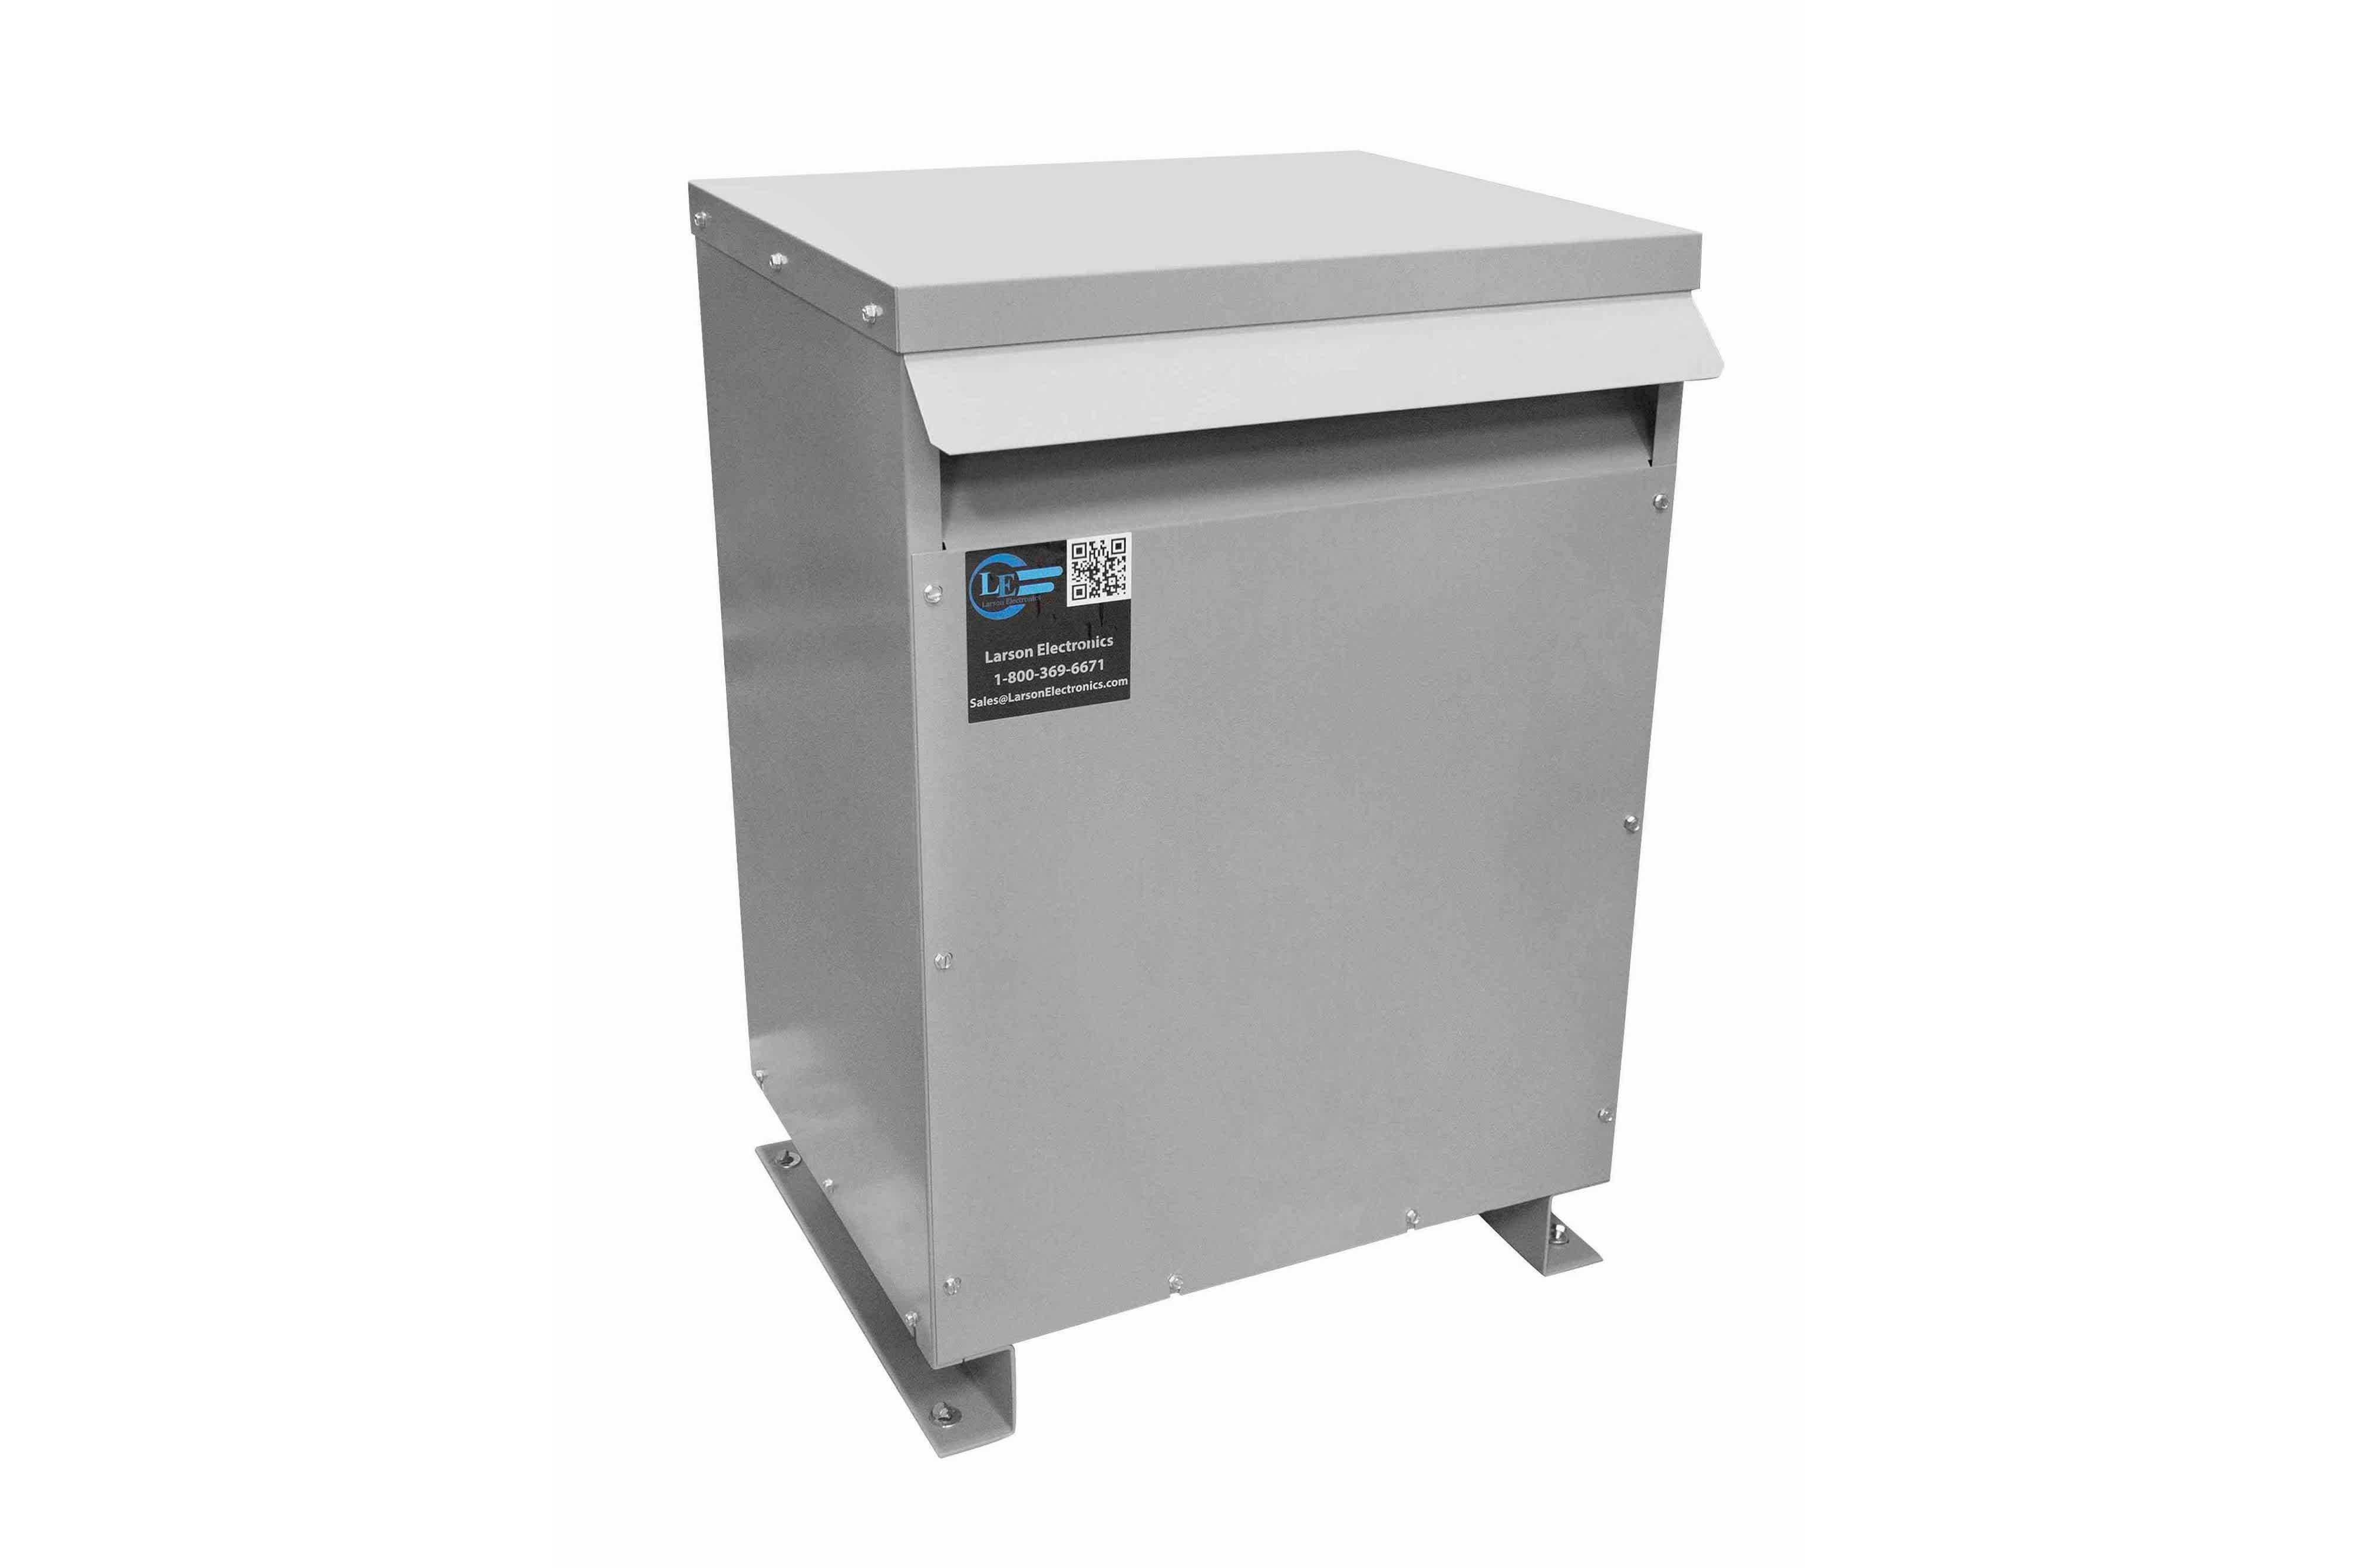 14 kVA 3PH Isolation Transformer, 208V Wye Primary, 400Y/231 Wye-N Secondary, N3R, Ventilated, 60 Hz